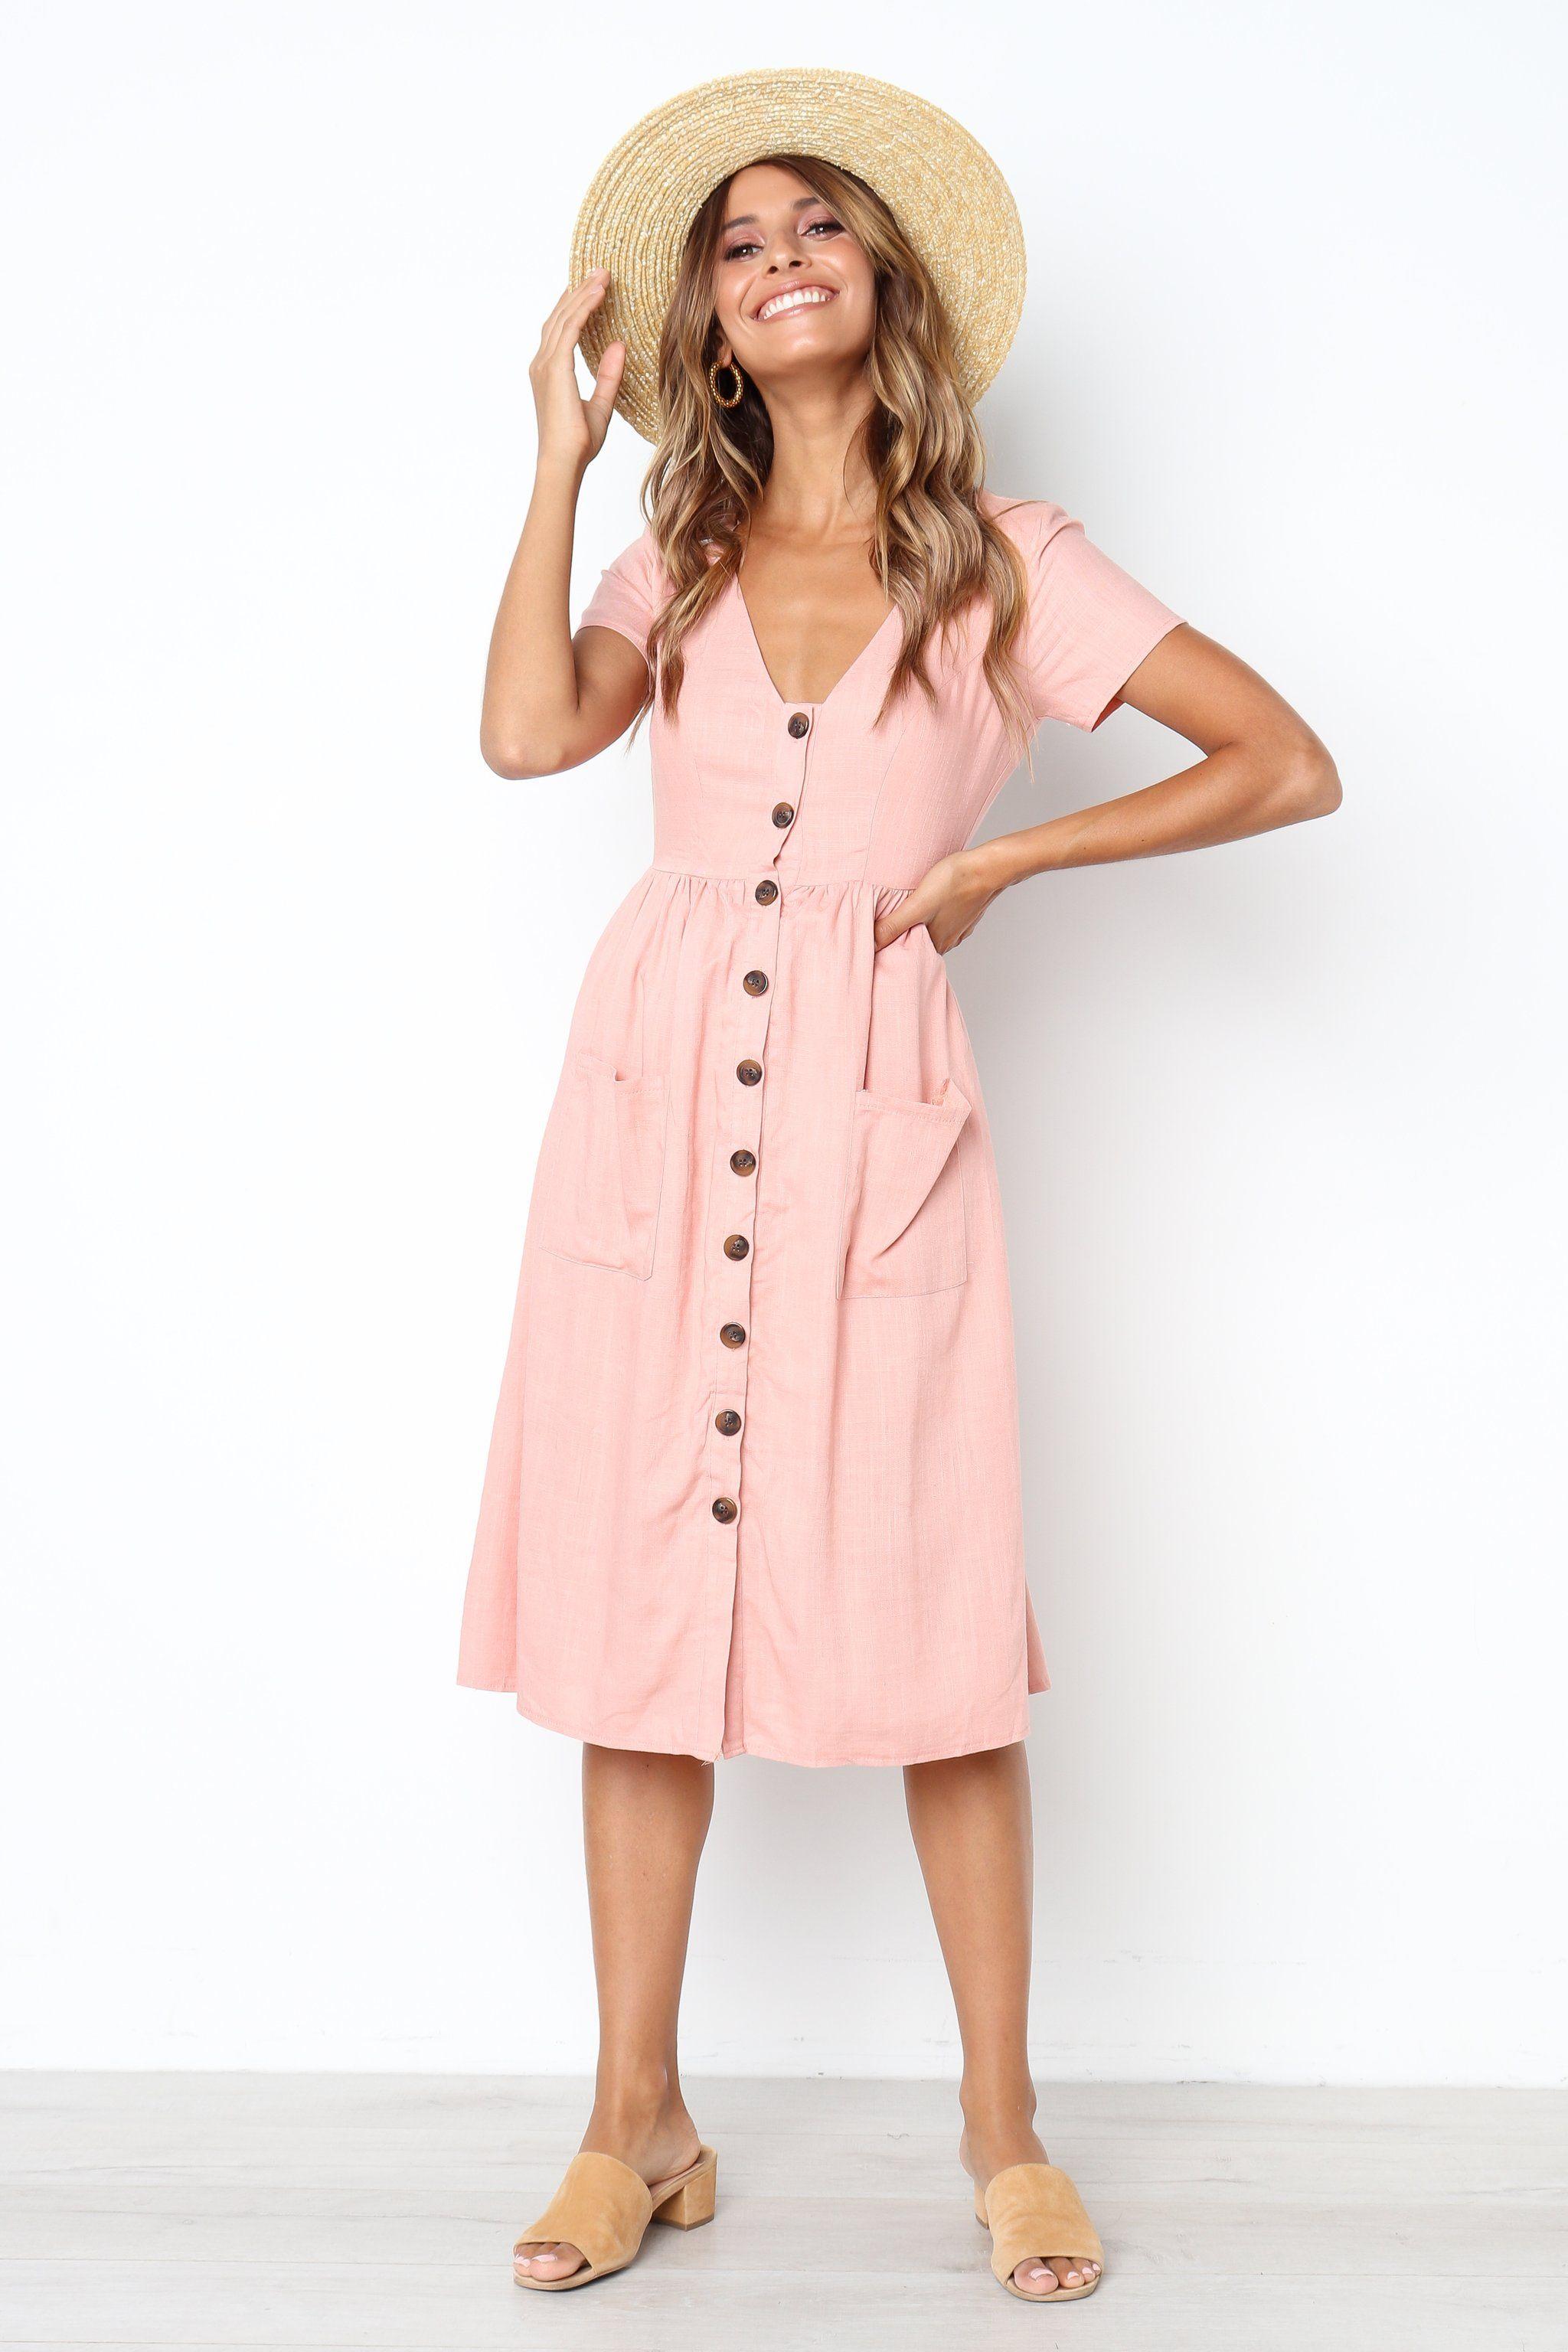 Vicky Dress Blush Midi Short Sleeve Dress Casual Summer Dresses Long Sleeve Swing Dress